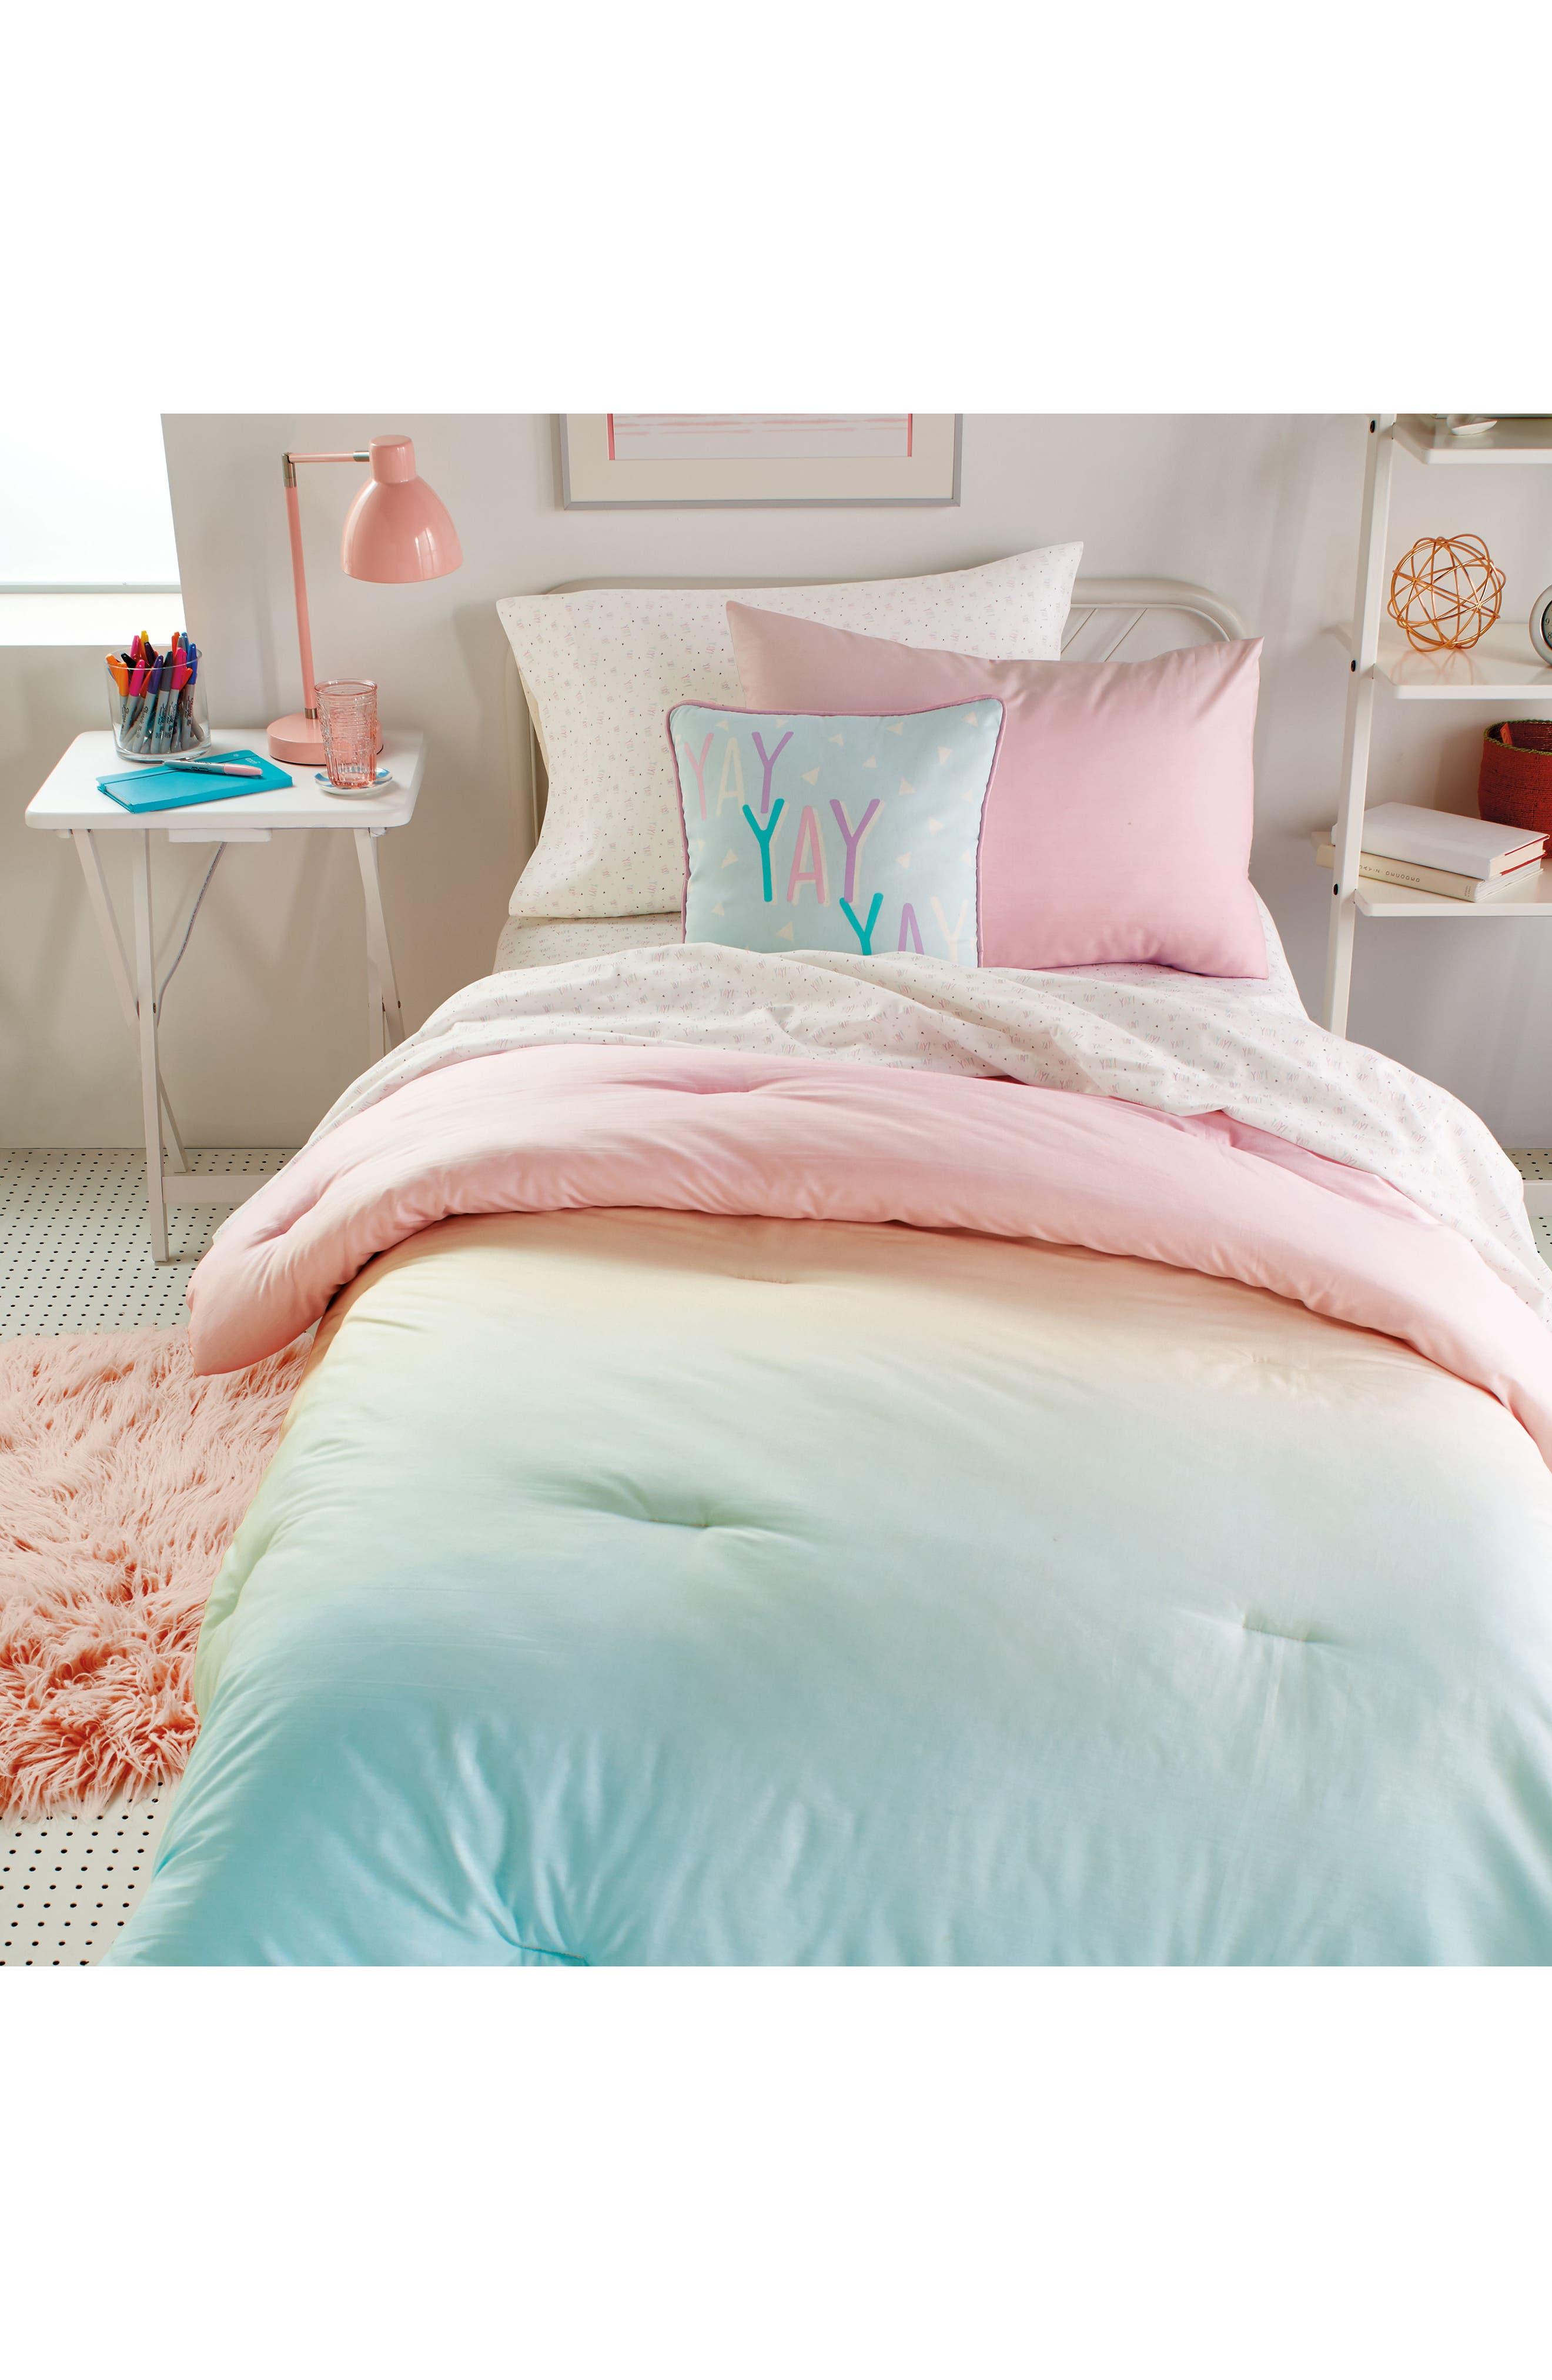 DKNY, Empire Light Comforter, Sham & Accent Pillow Set, Alternate thumbnail 5, color, 675